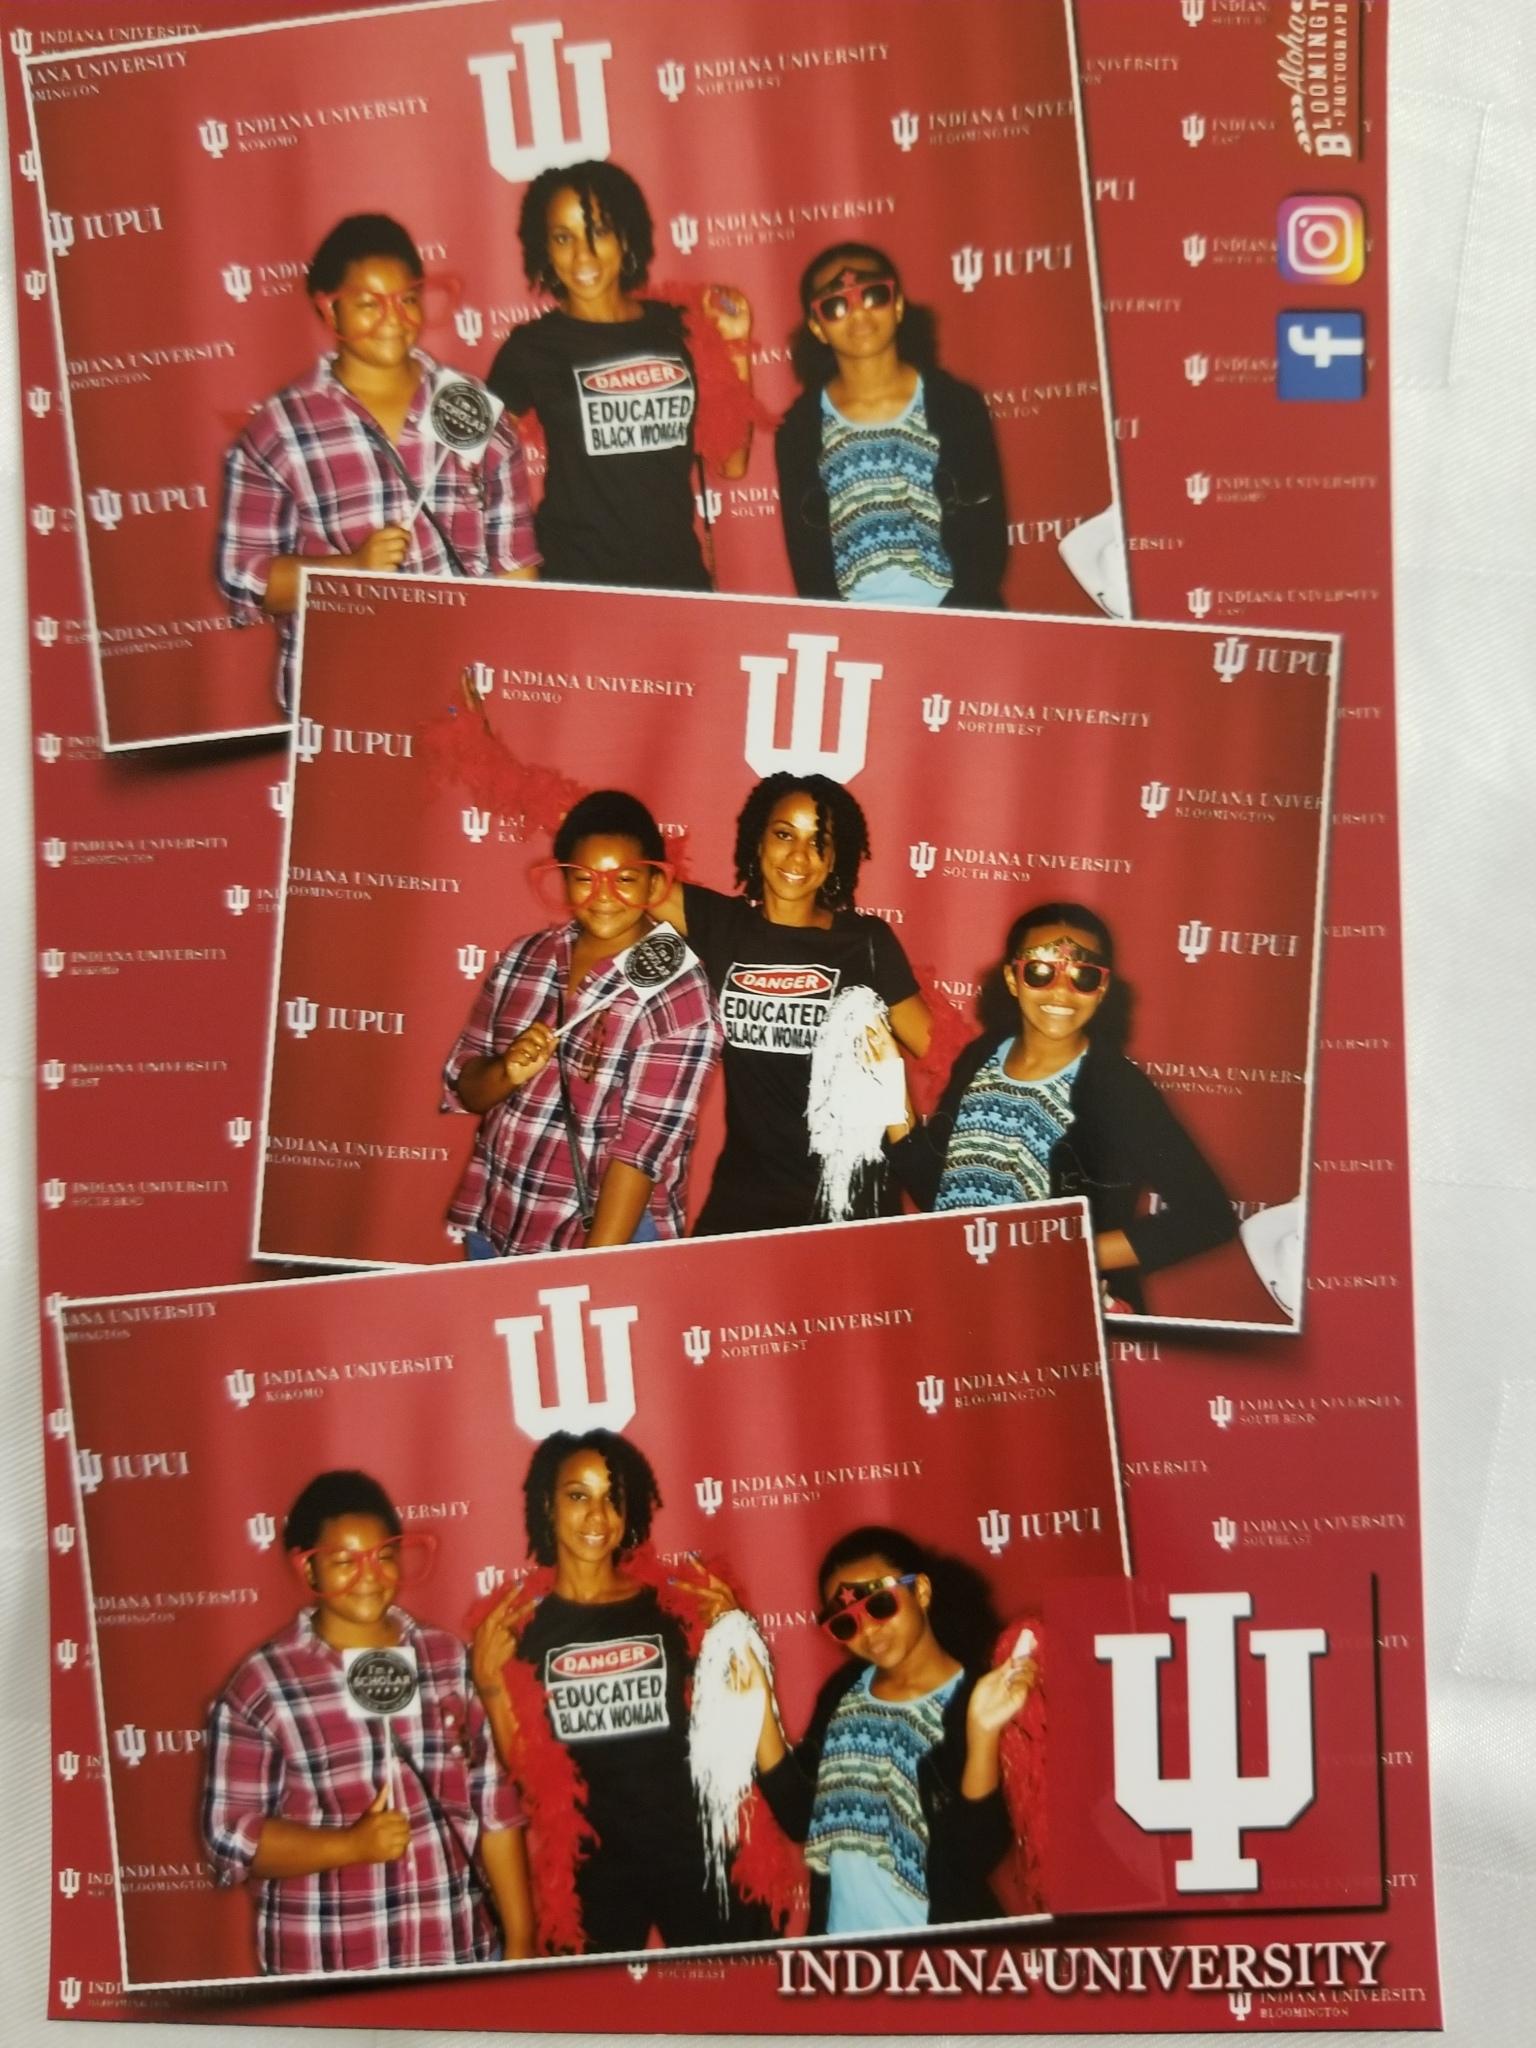 IU Indy Black Expo